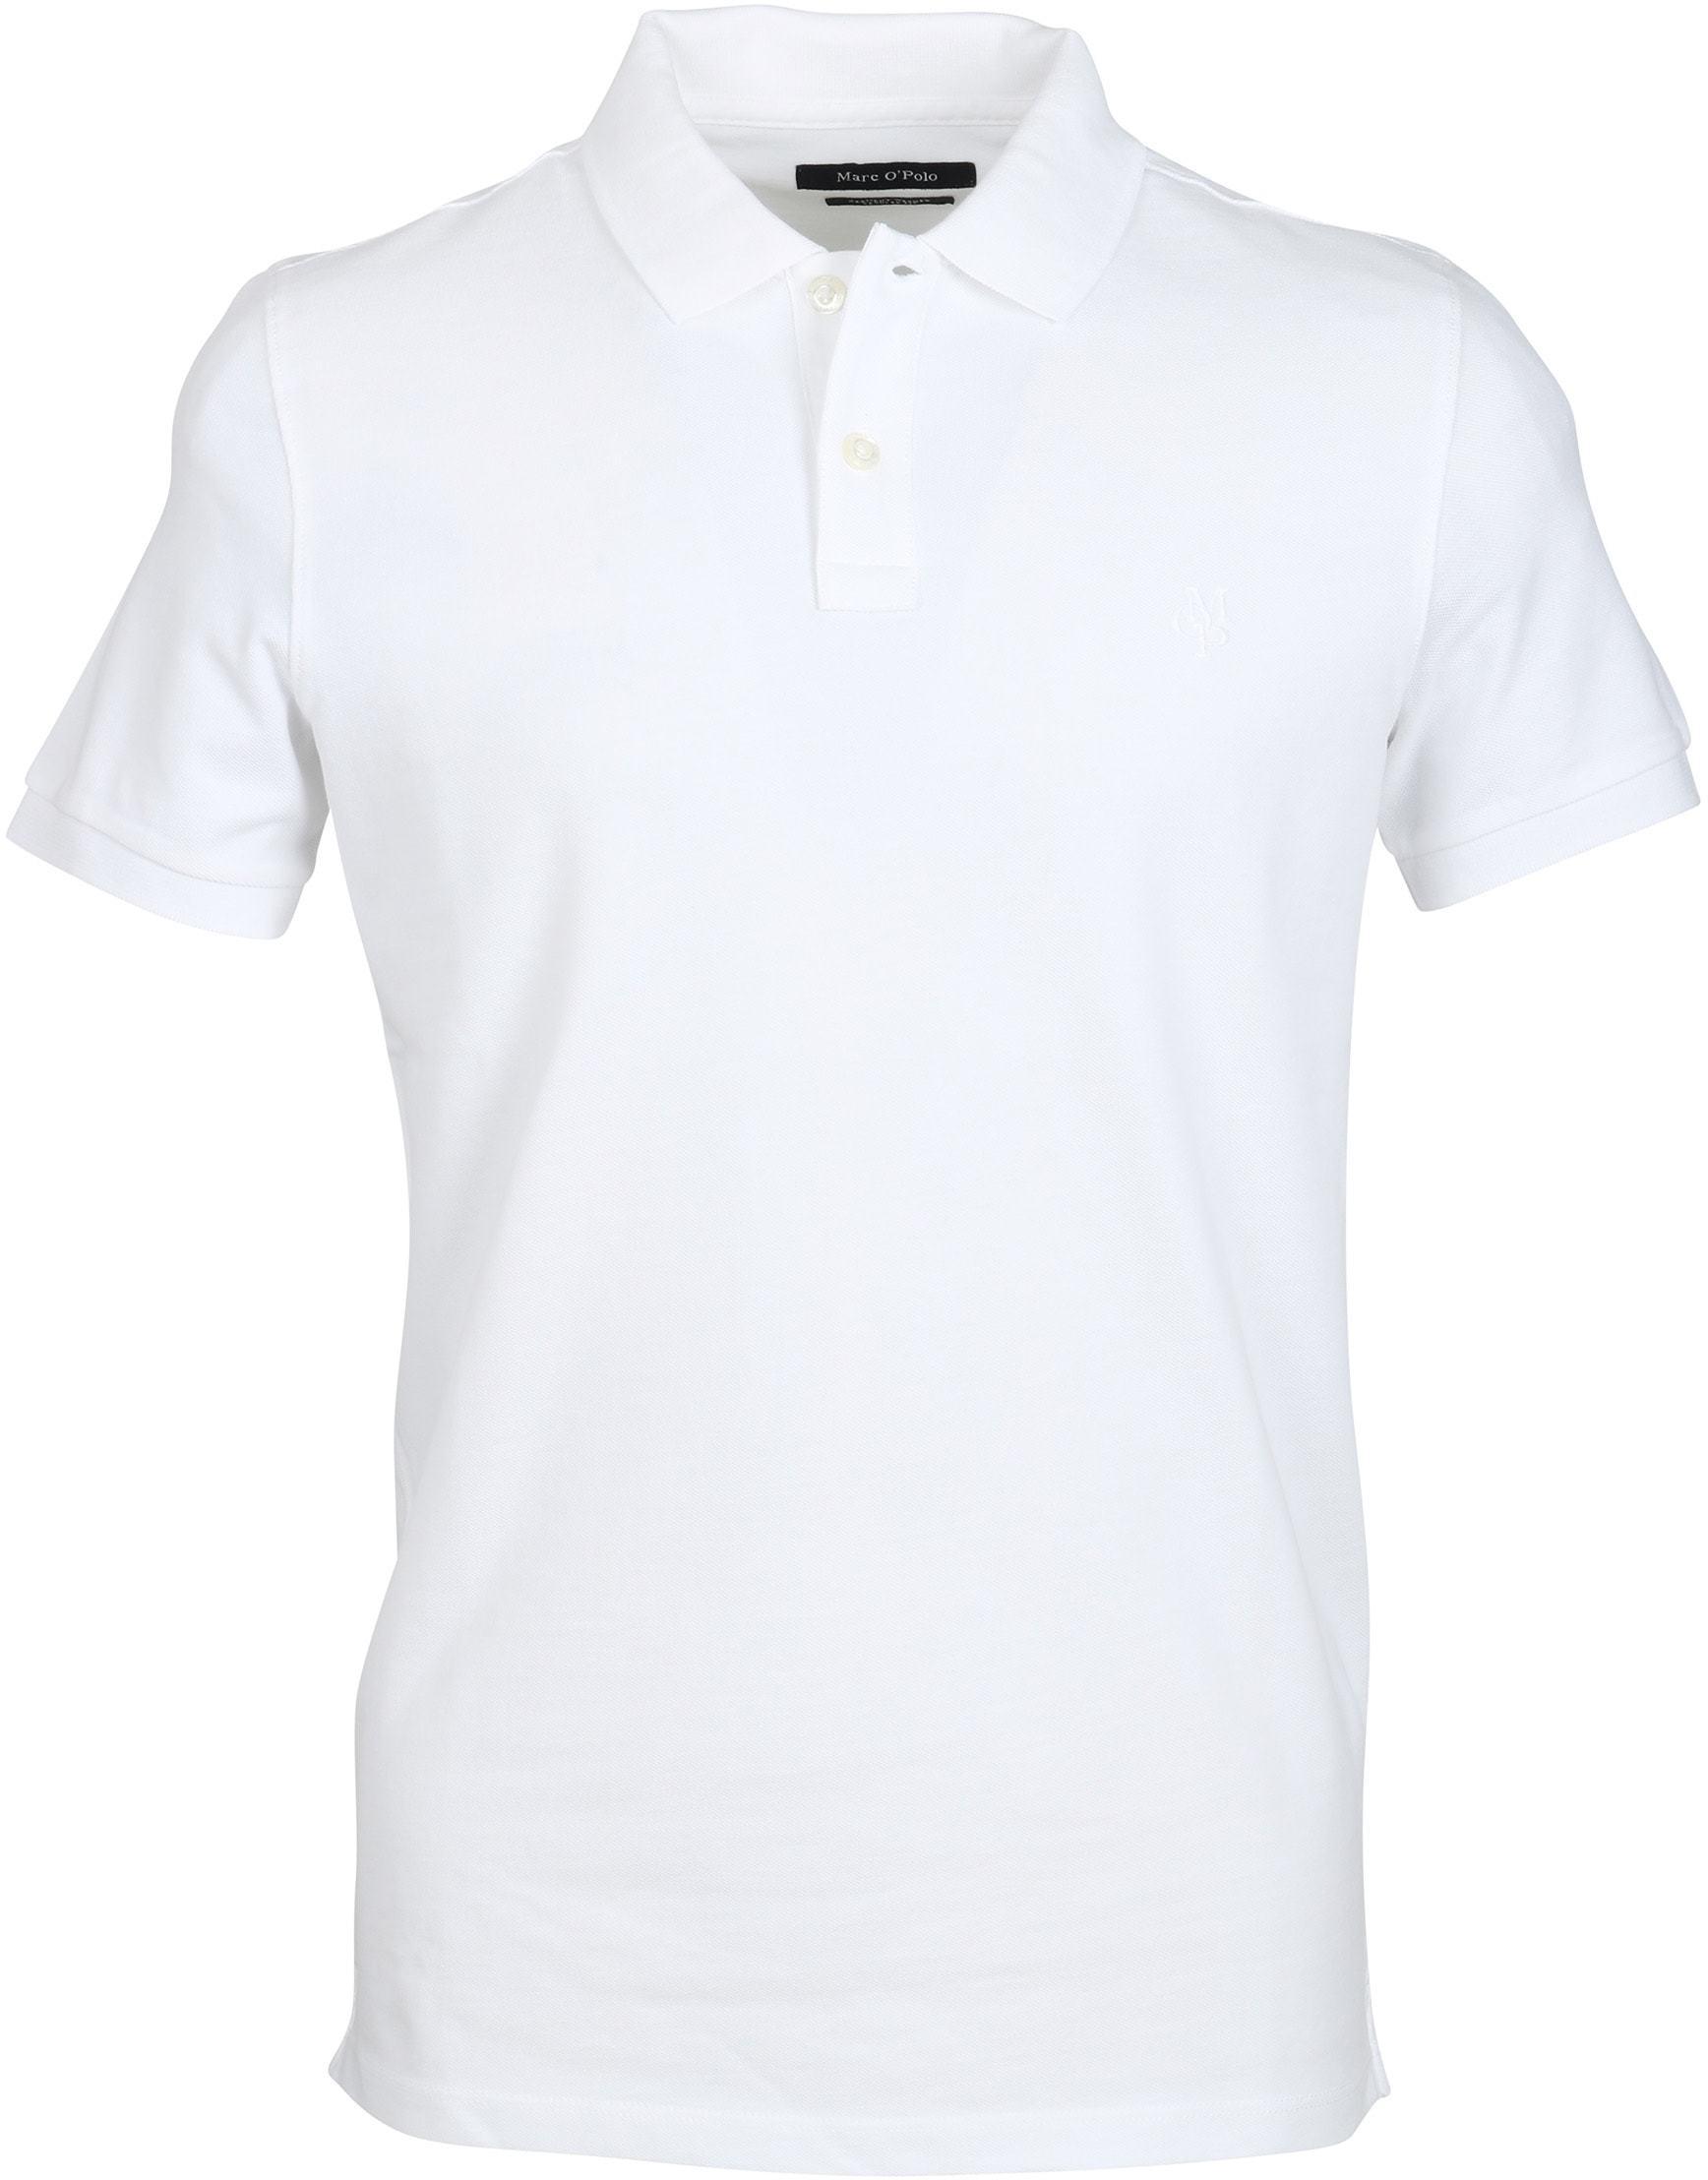 Marc O'Polo Poloshirt Uni Wit foto 0